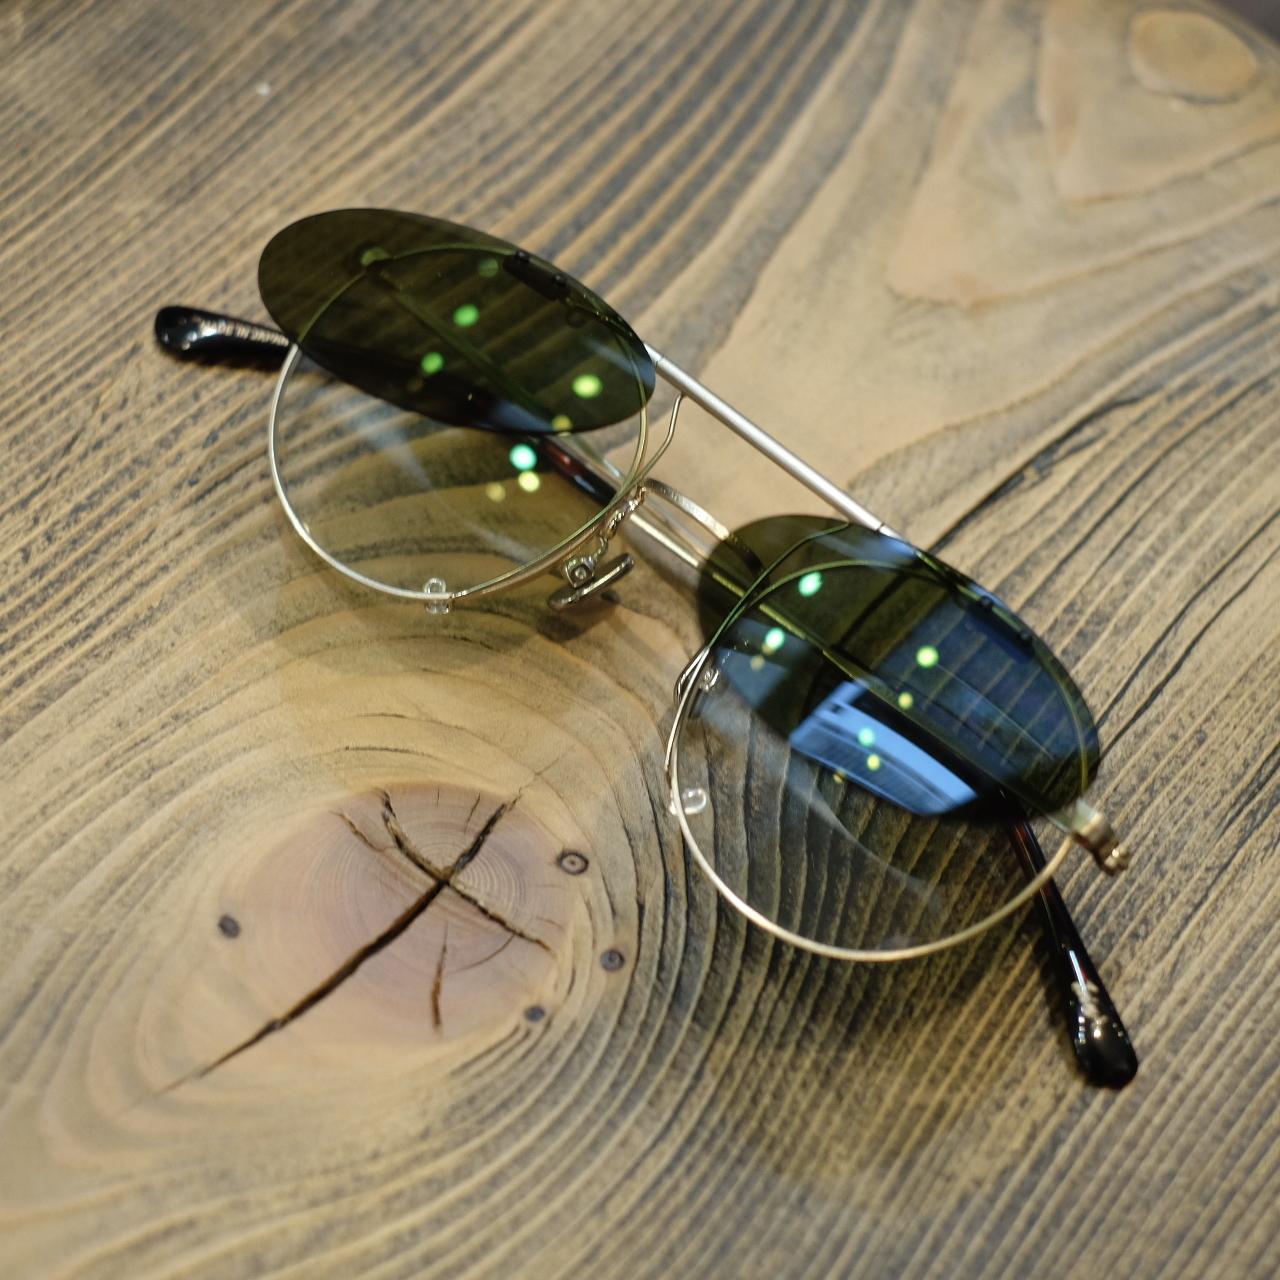 1sin×金子眼鏡 innovatorⅤ クリップオンサングラス・眼鏡 シャンパンゴールドフレーム×グリーンレンズ